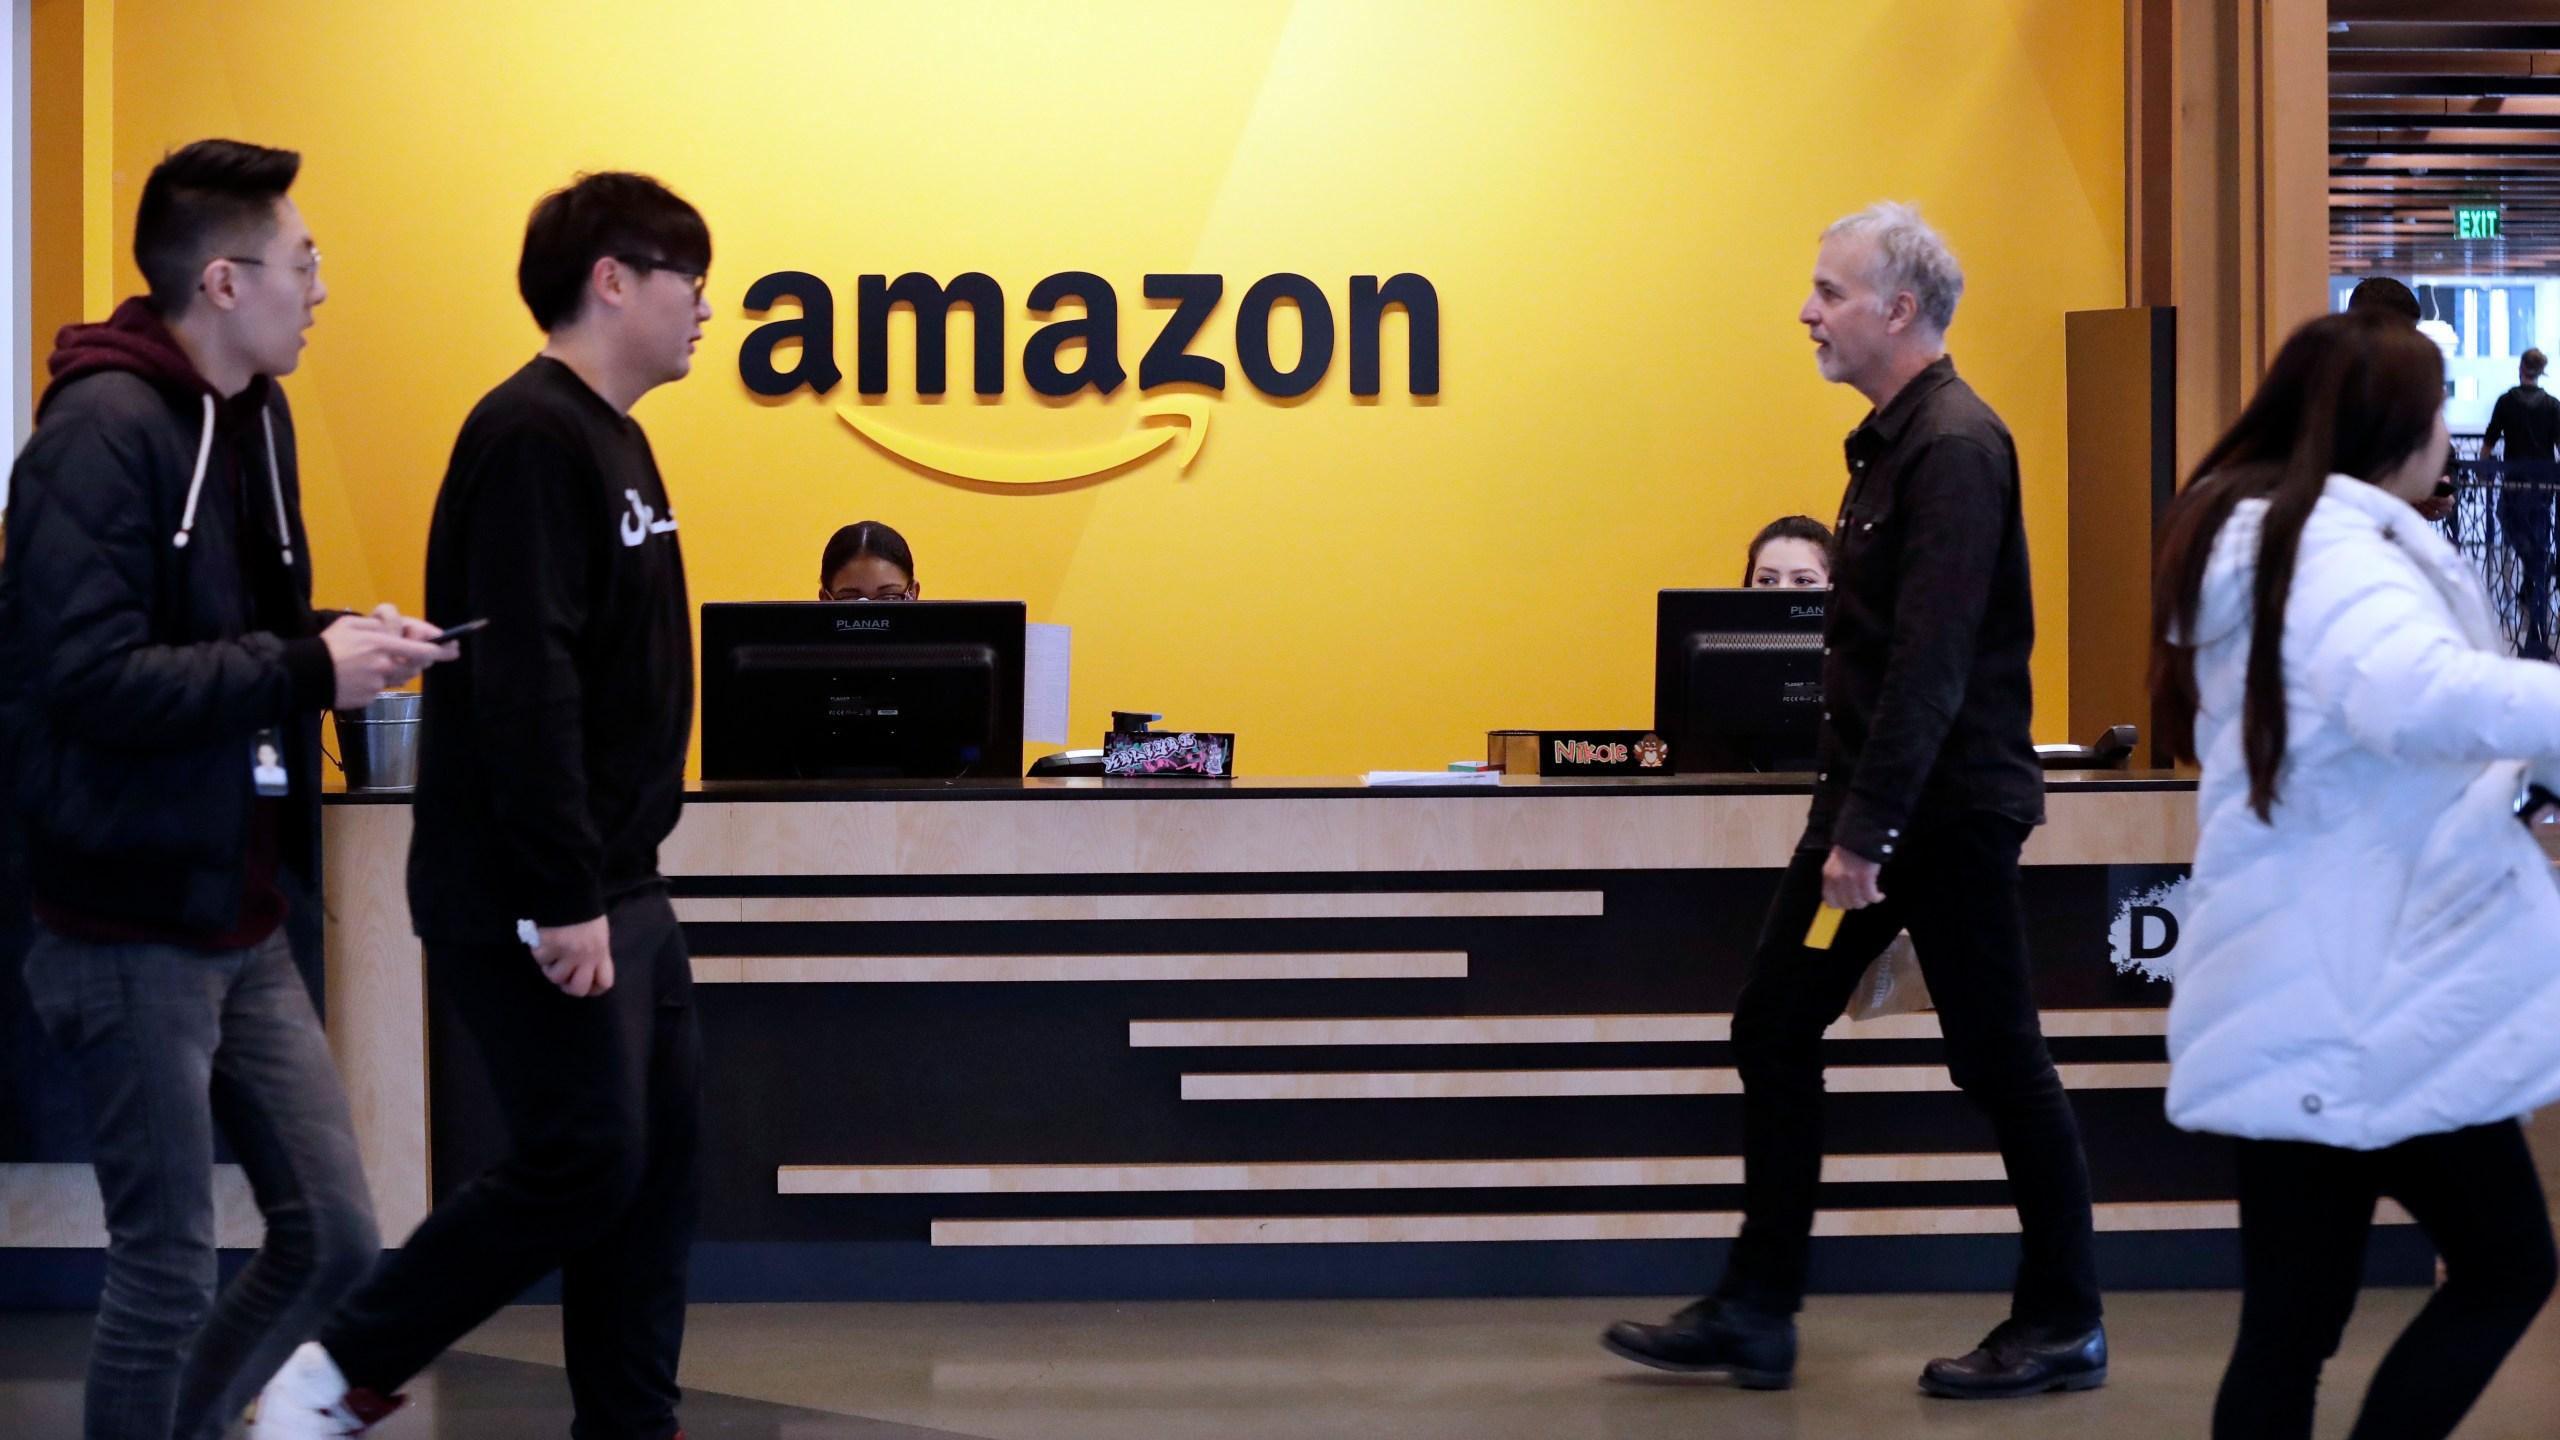 In this Nov. 13, 2018, file photo, employees walk through a lobby at Amazon's headquarters in Seattle. (Elaine Thompson/AP Photo)